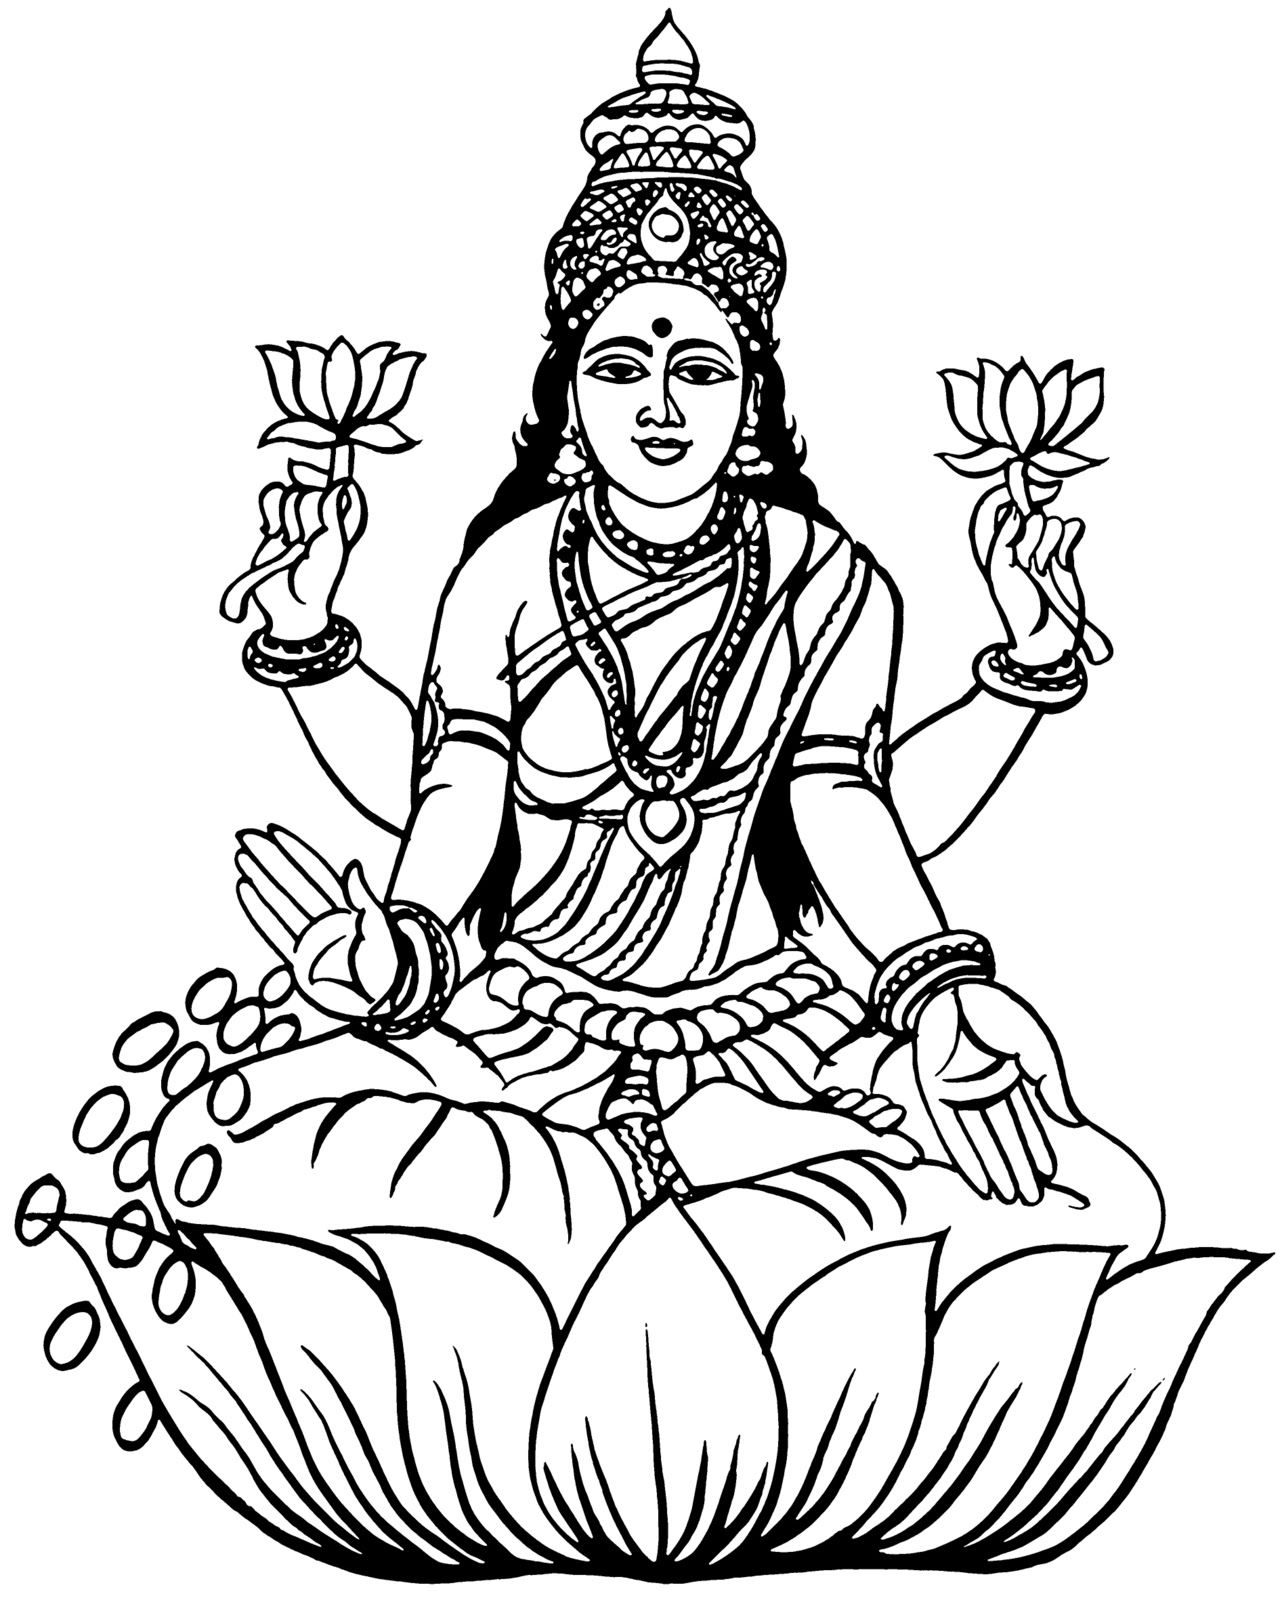 gods-clipart-laxmi-12.jpg (1282×1600) | Cartoon clip art ...